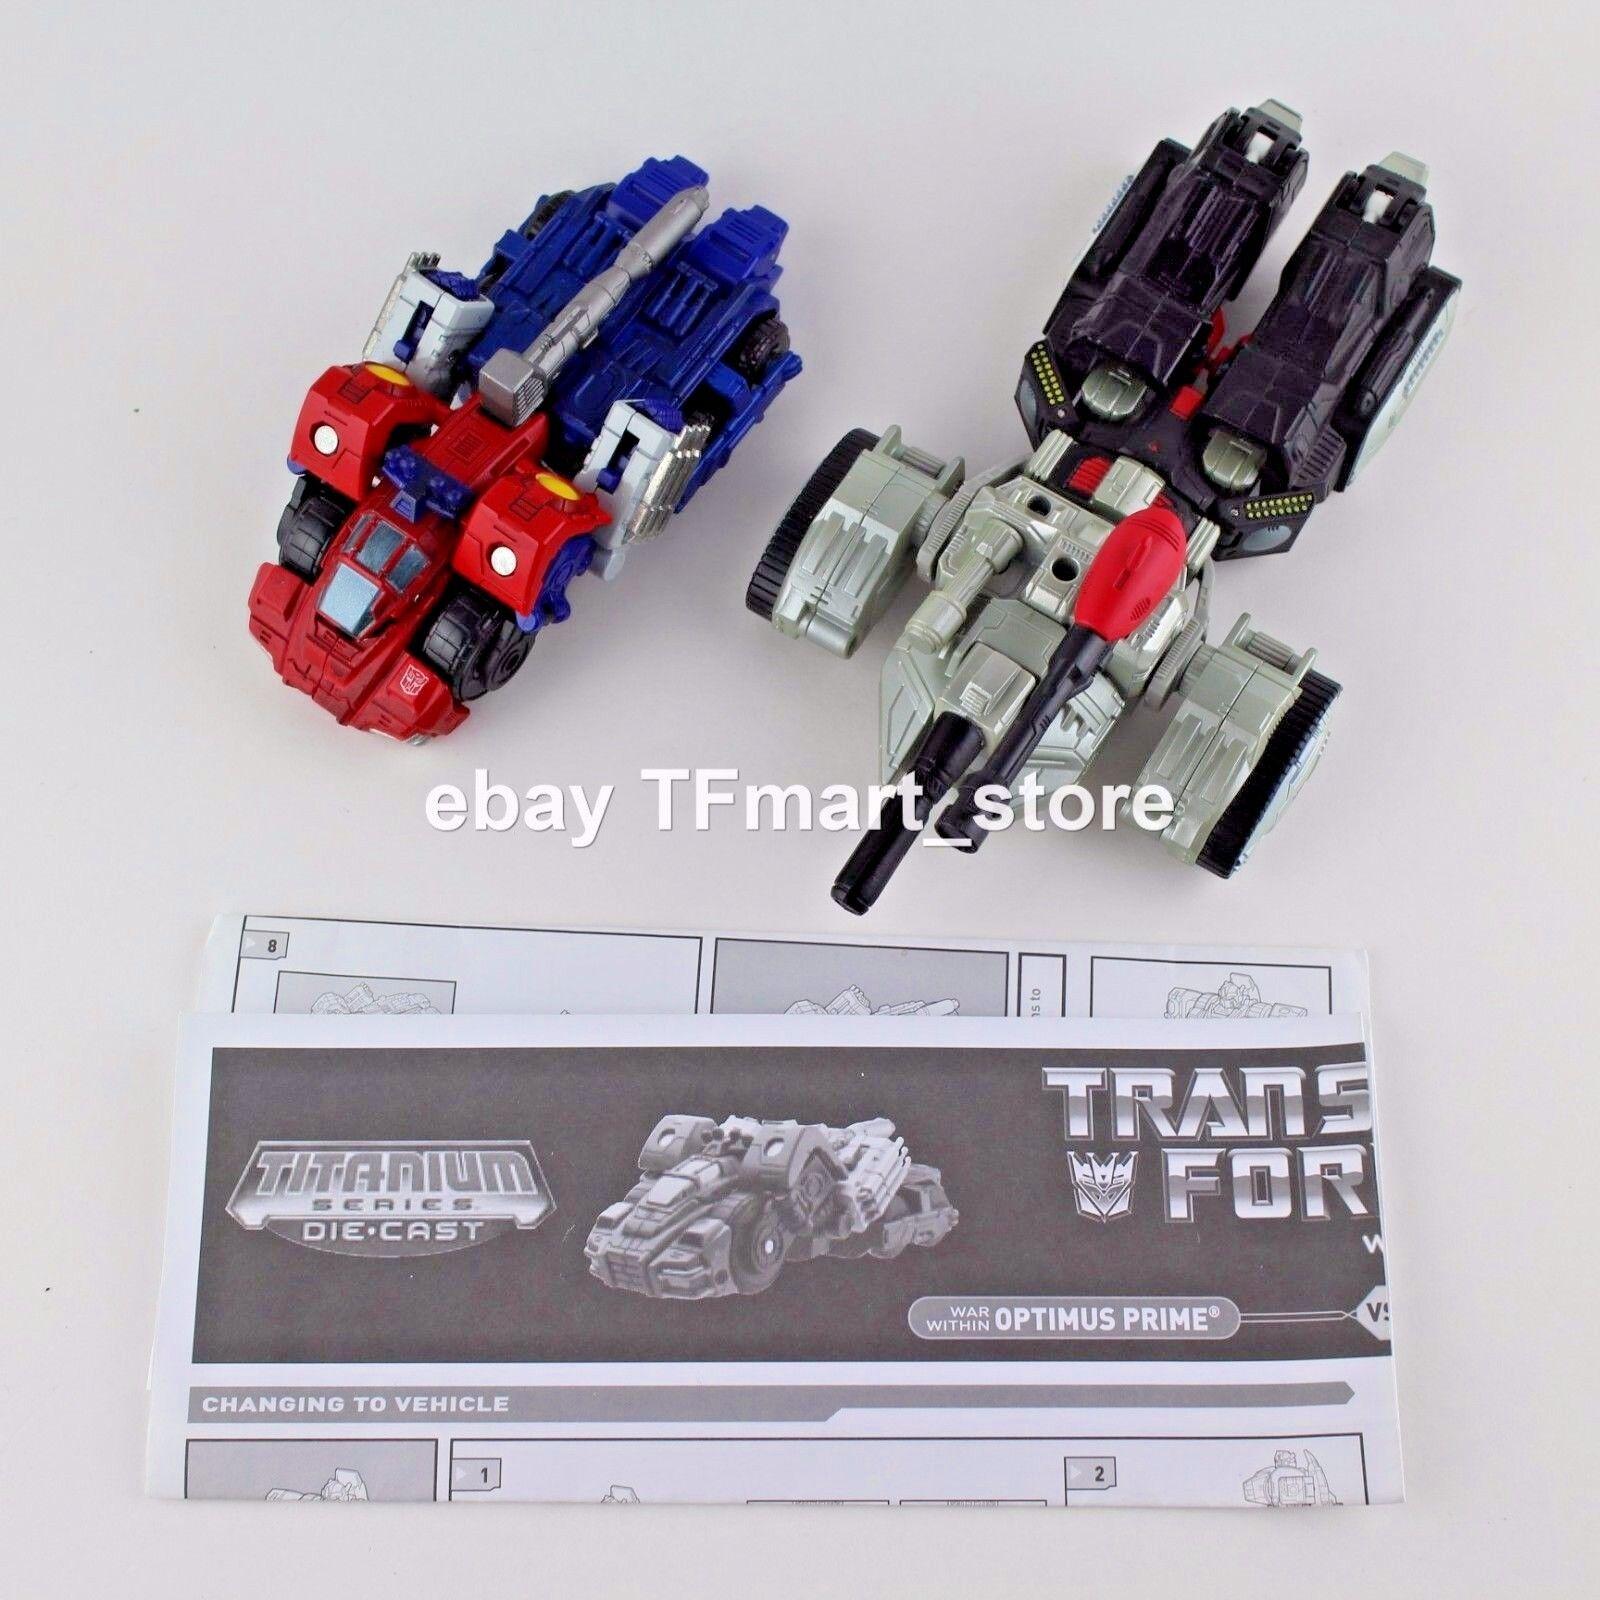 Transformers Titanio 6   Serie Guerra dentro Optimus Prime Vs.Megatron